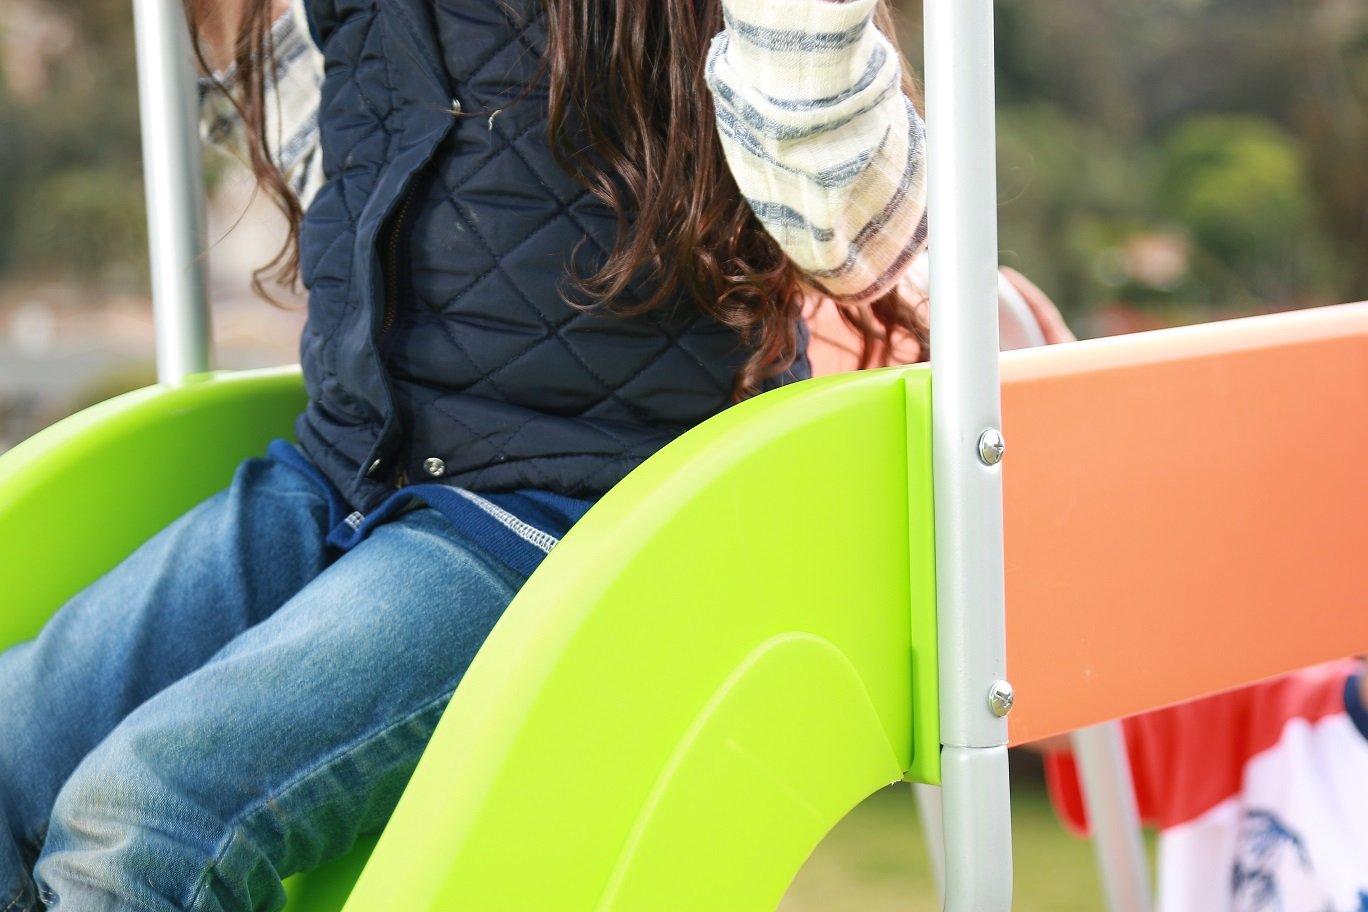 SLIDEWHIZZER Outdoor Play Set Kids Slide: 10 ft Freestanding Climber, Swingsets, Playground Jungle Gyms Kids Love - Above Ground Pool Slide for Summer Backyard by SLIDEWHIZZER (Image #7)